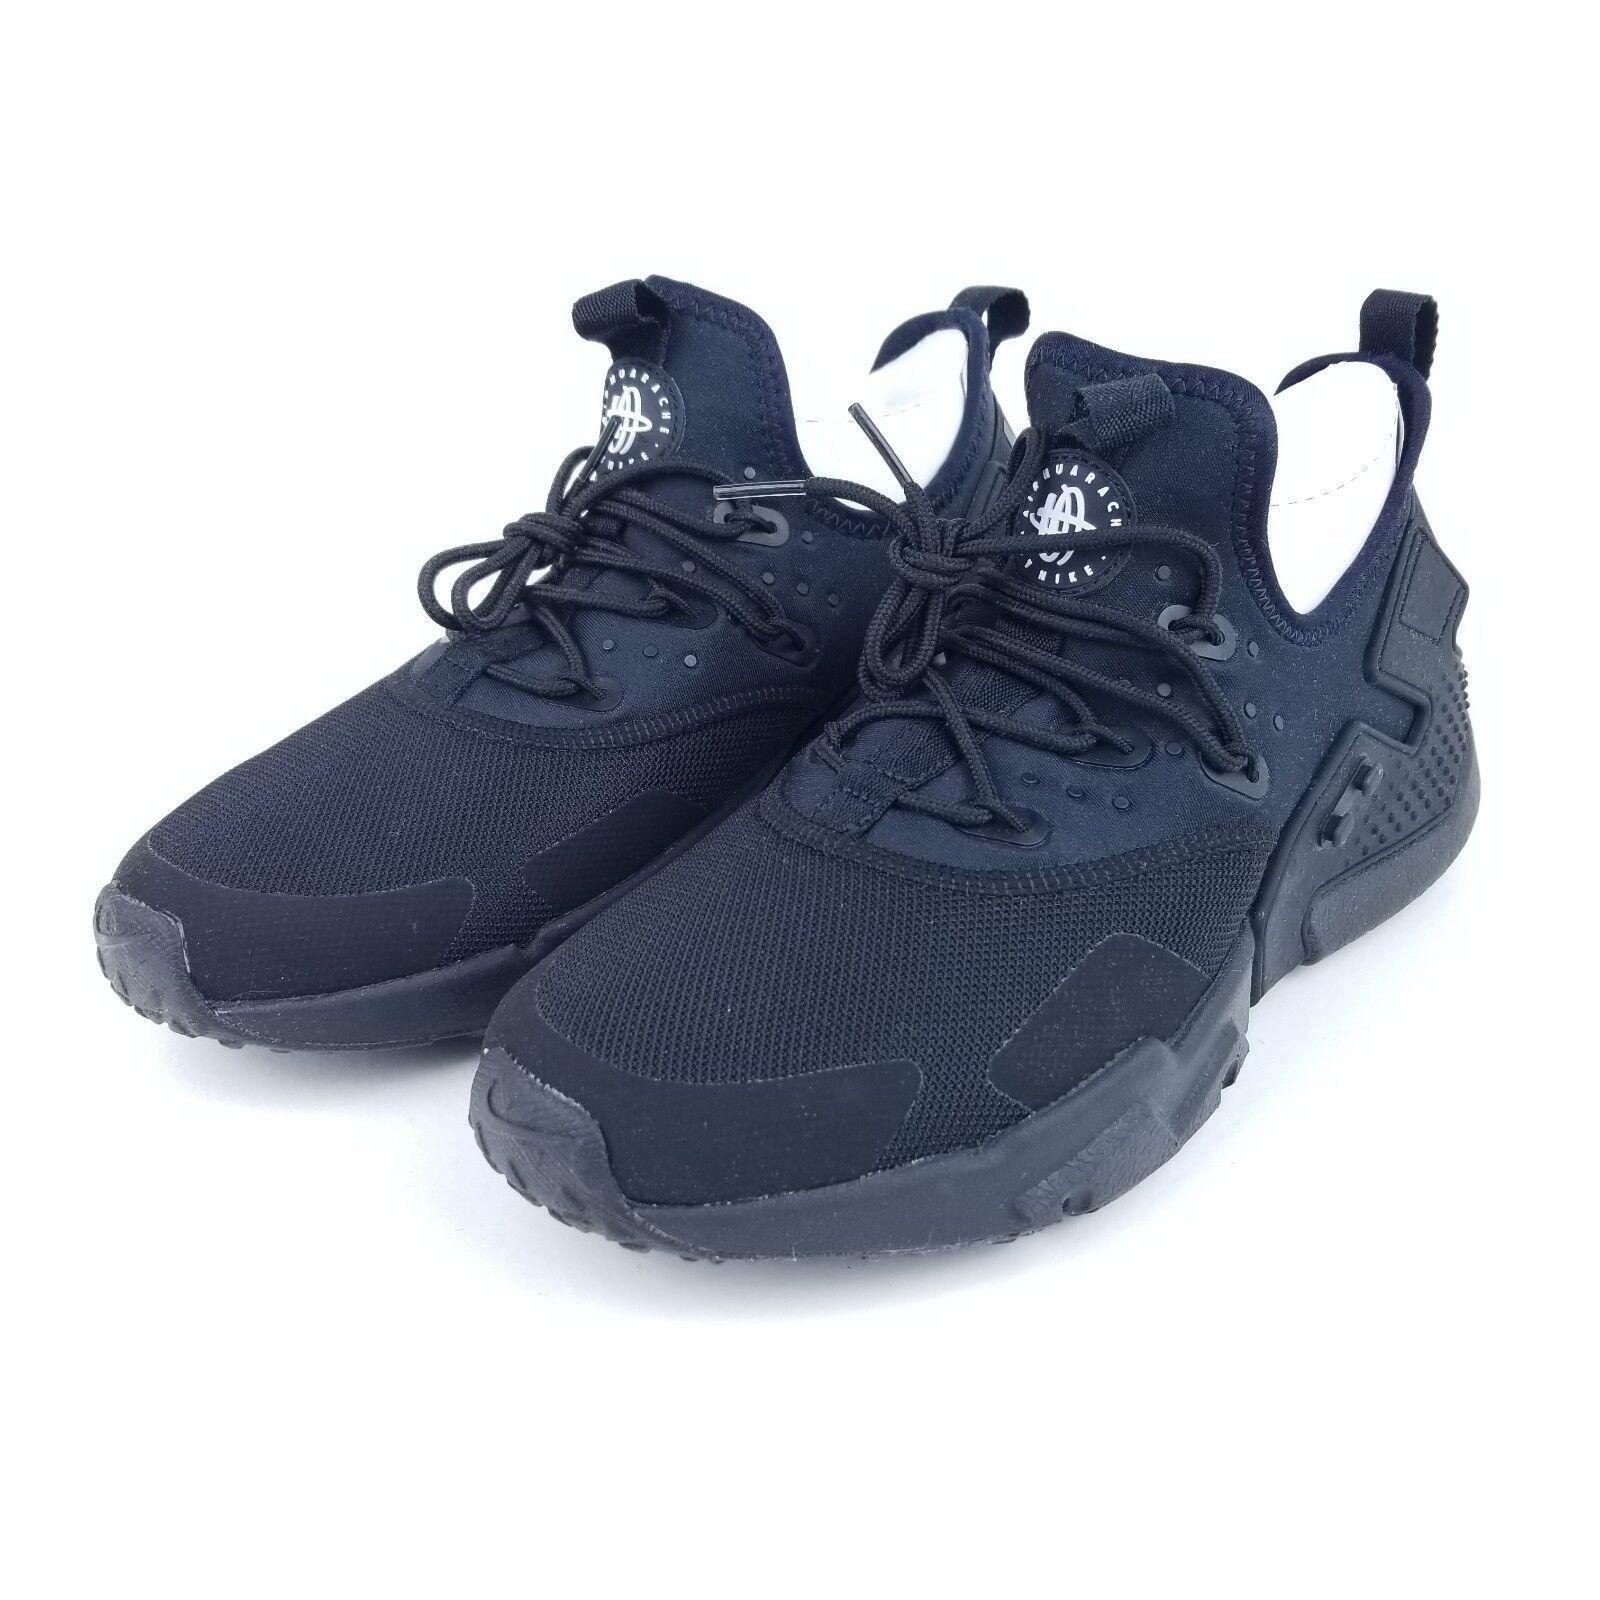 Nike Air Huarache Drift Triple Black Men's Running Shoes AH7334 003 Size **